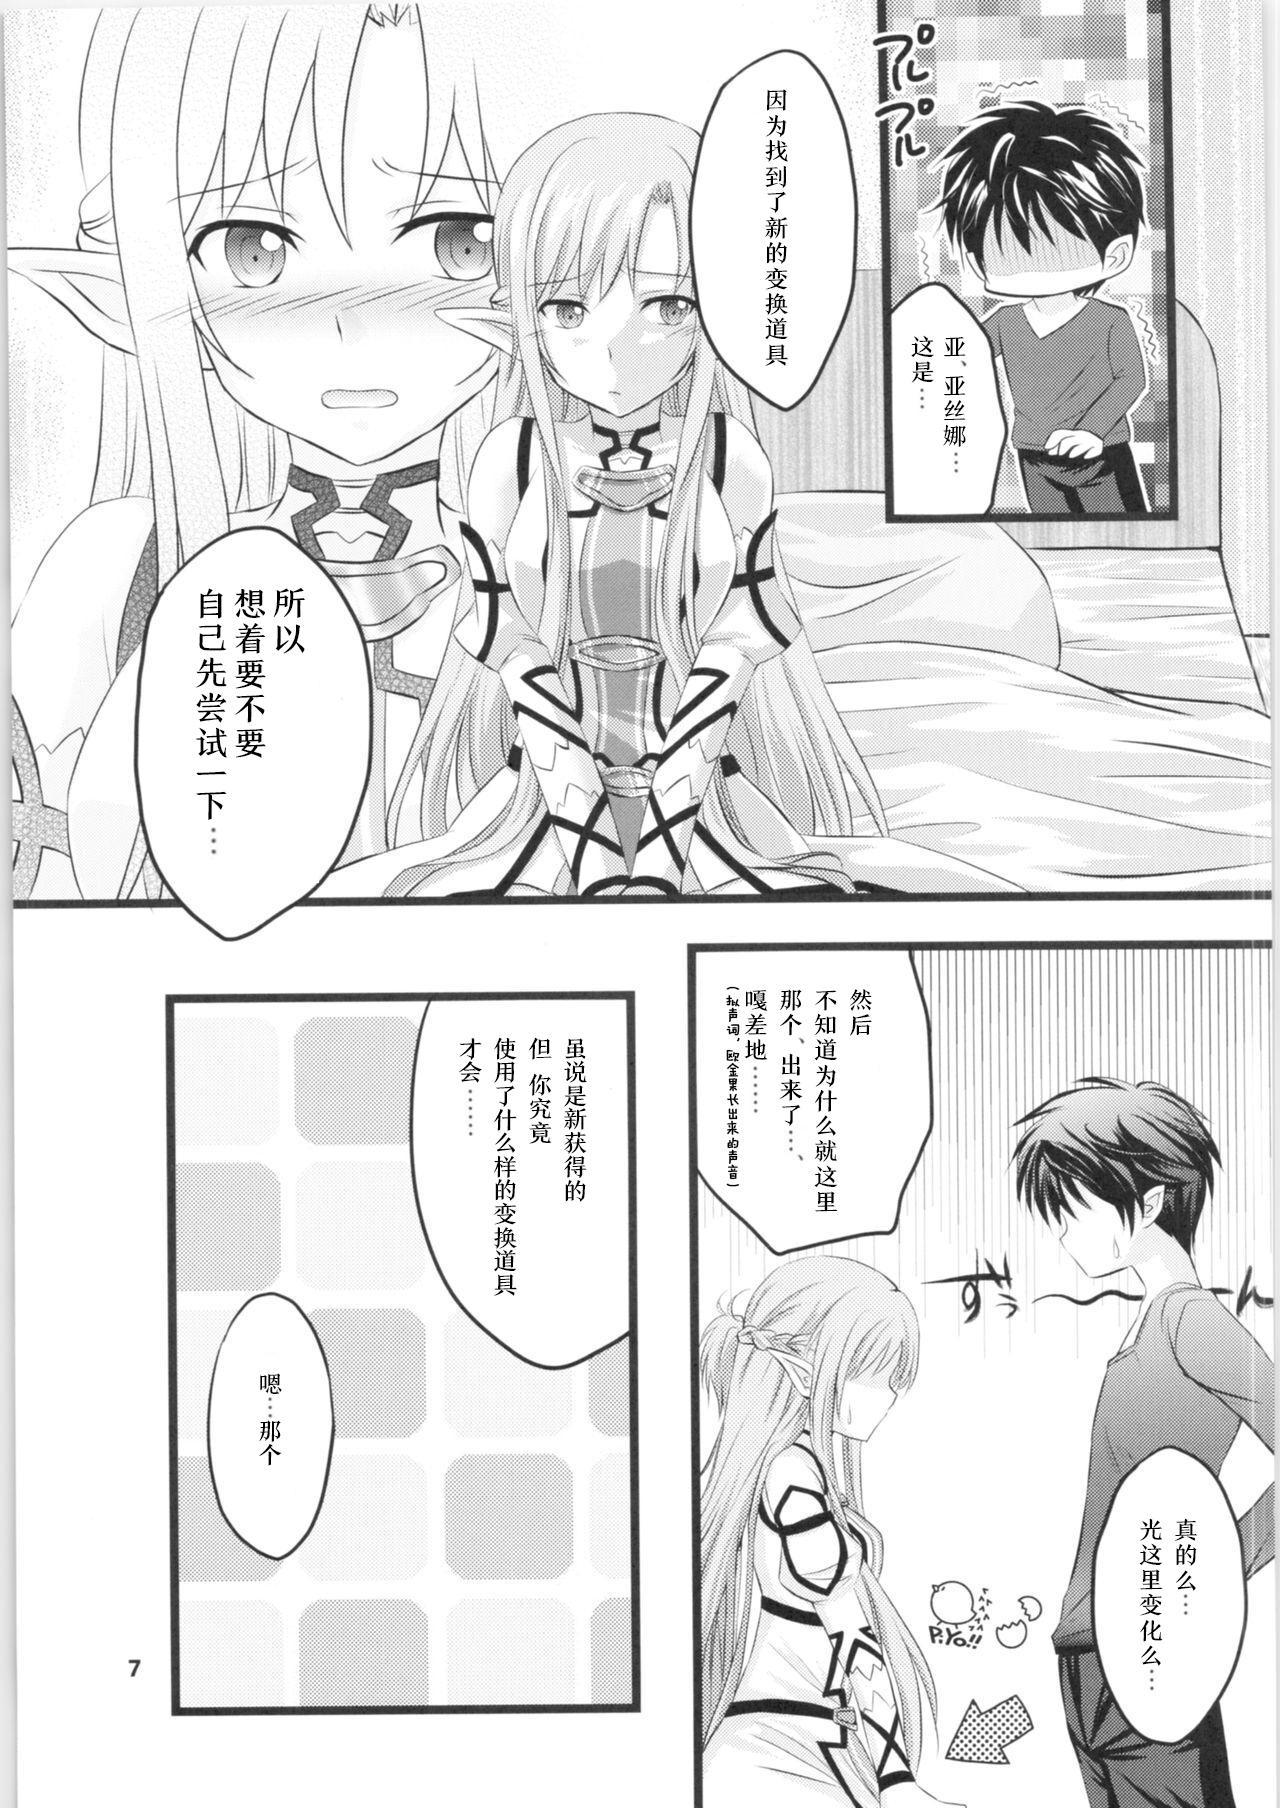 Kiriko-chan to Asobou! 2 5